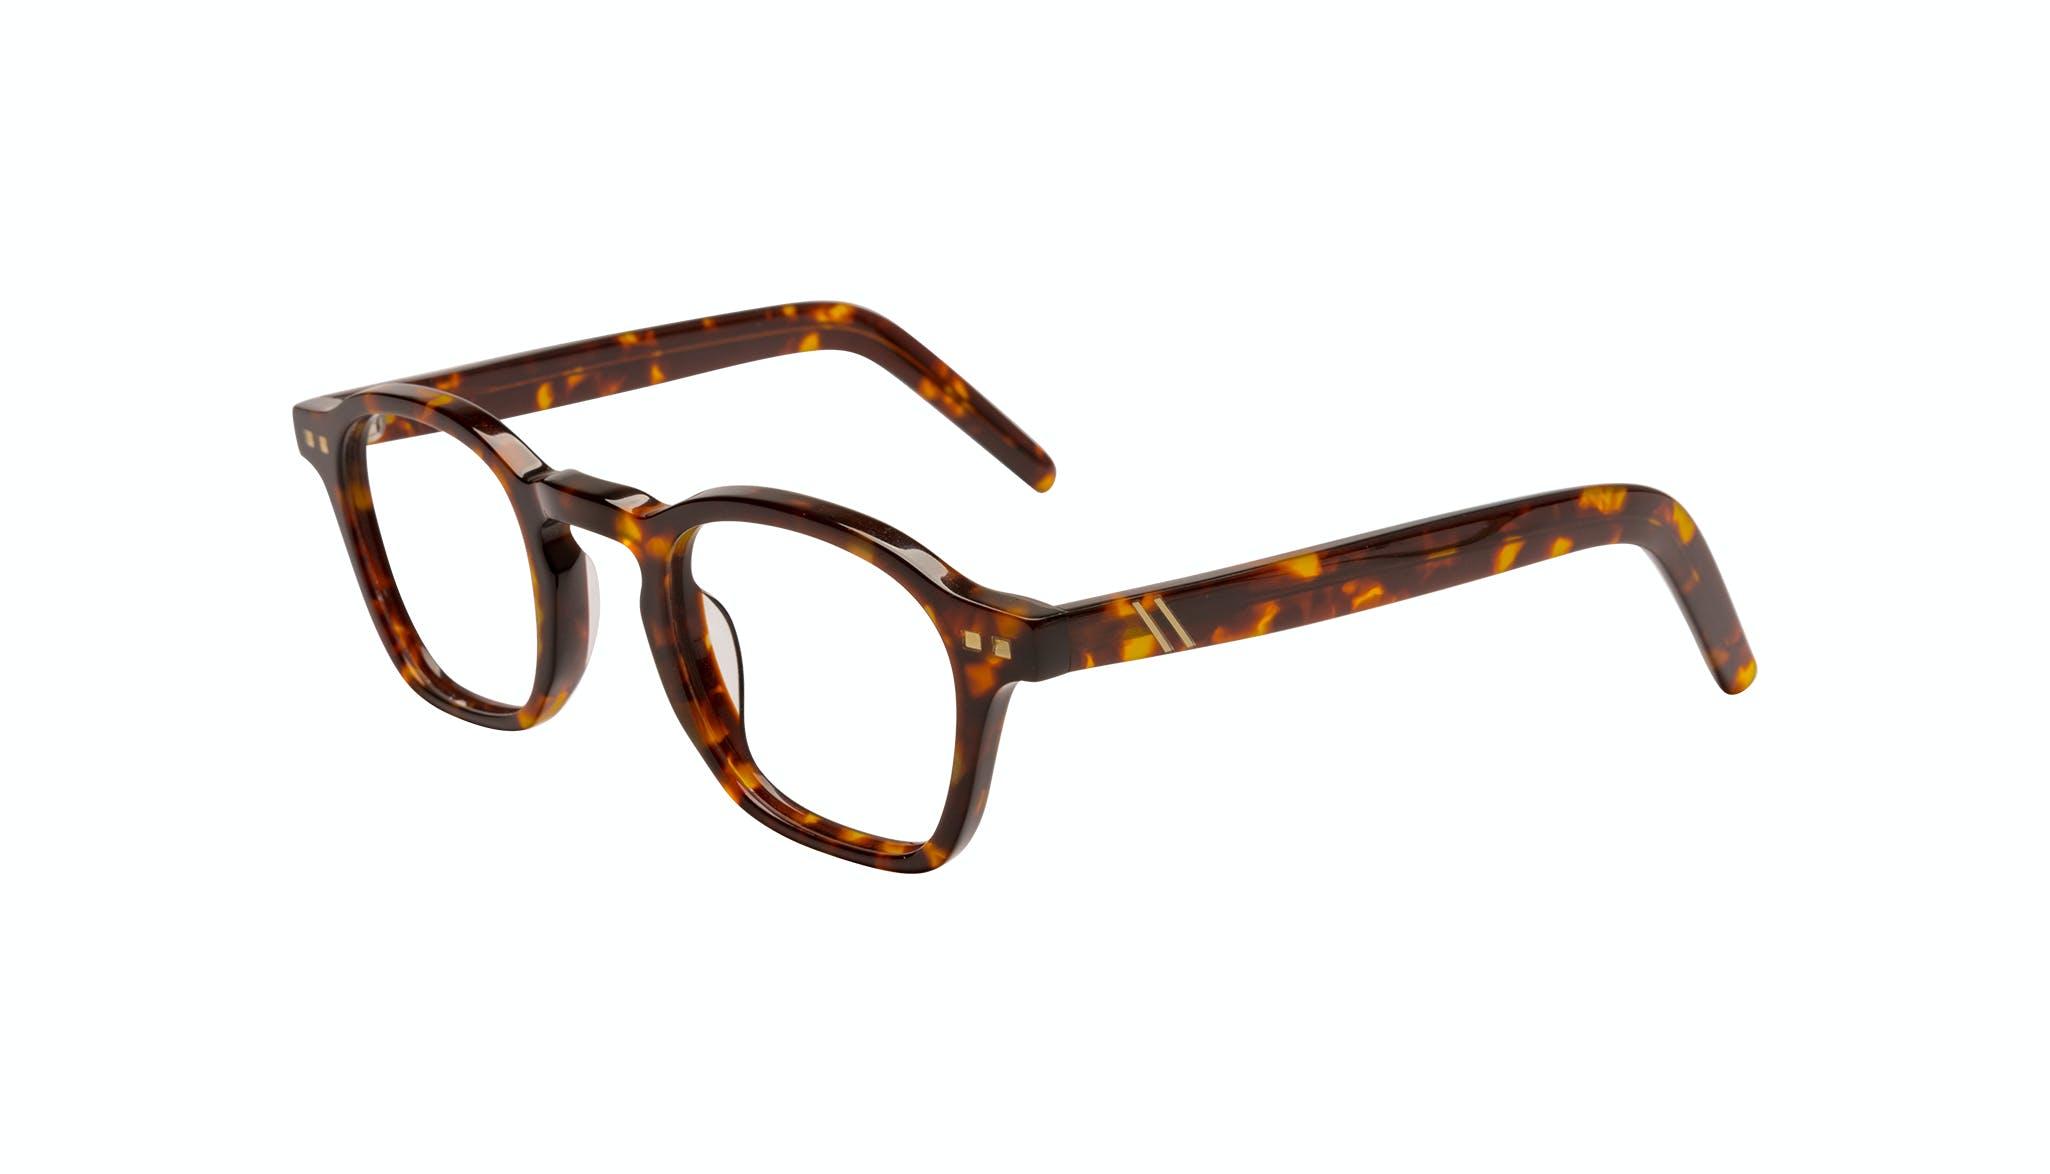 Affordable Fashion Glasses Square Eyeglasses Men Brisk Tortoise Tilt